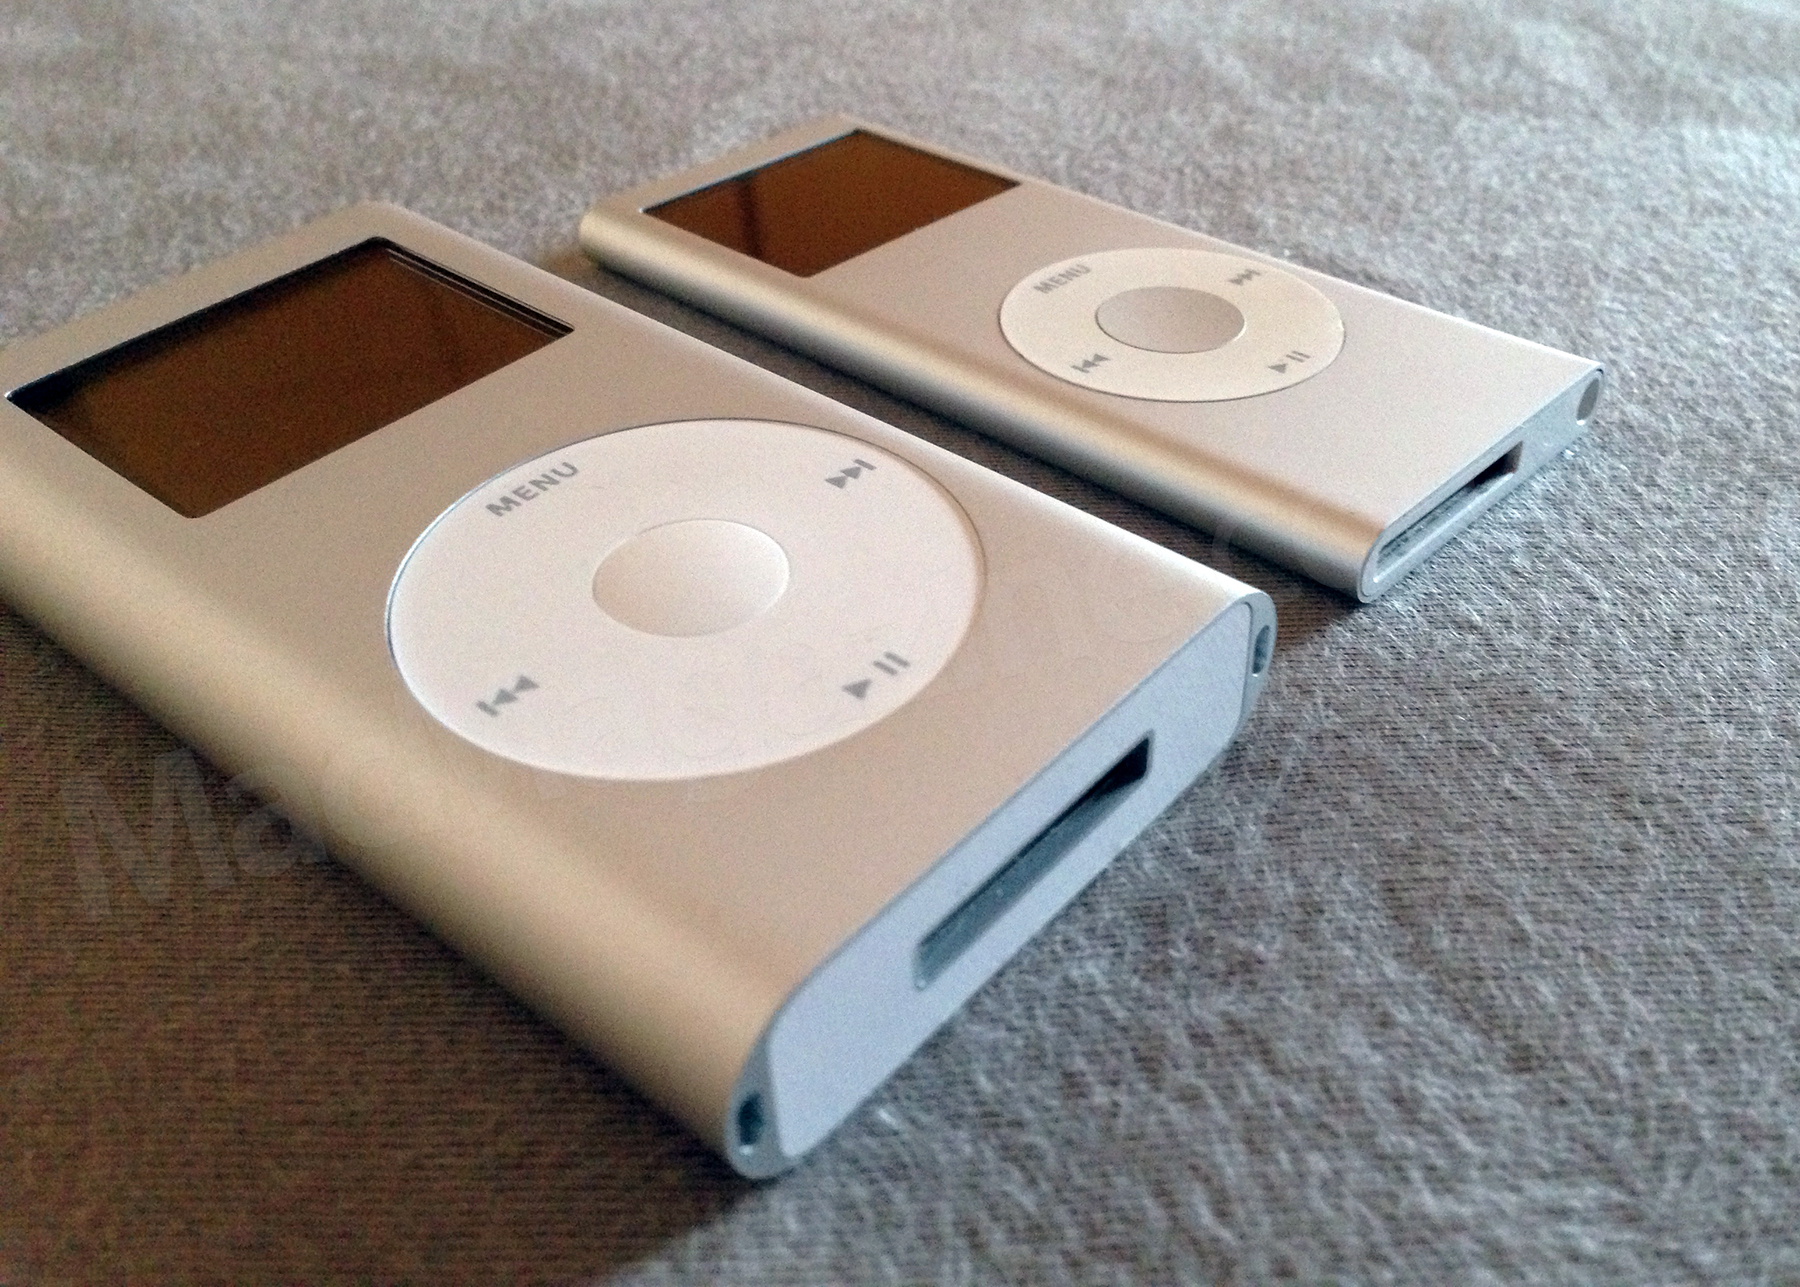 iPod mini ao lado do nano, do Wilsians